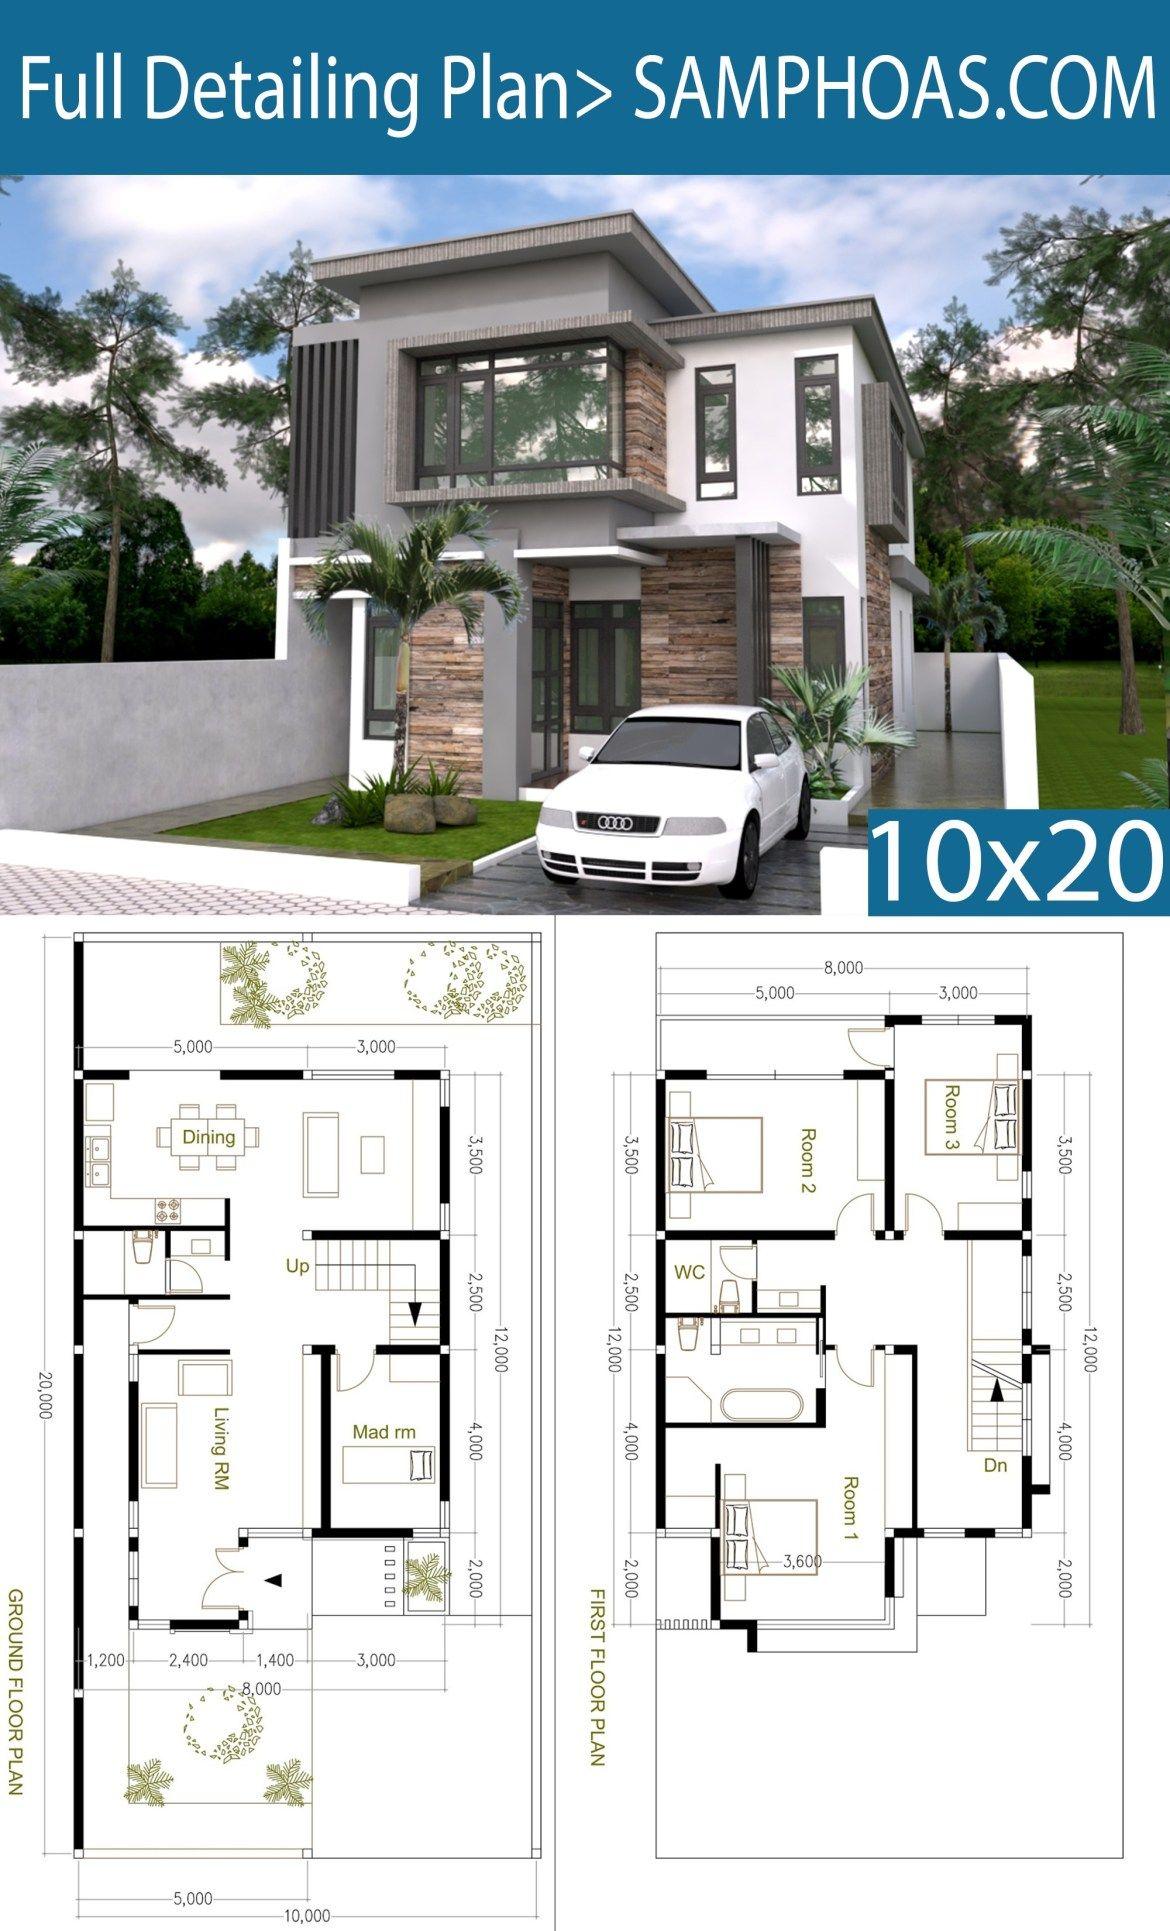 4 Bedroom Modern Home Plan Size 8x12m Samphoas Plansearch Model House Plan Dream House Plans Modern House Plans